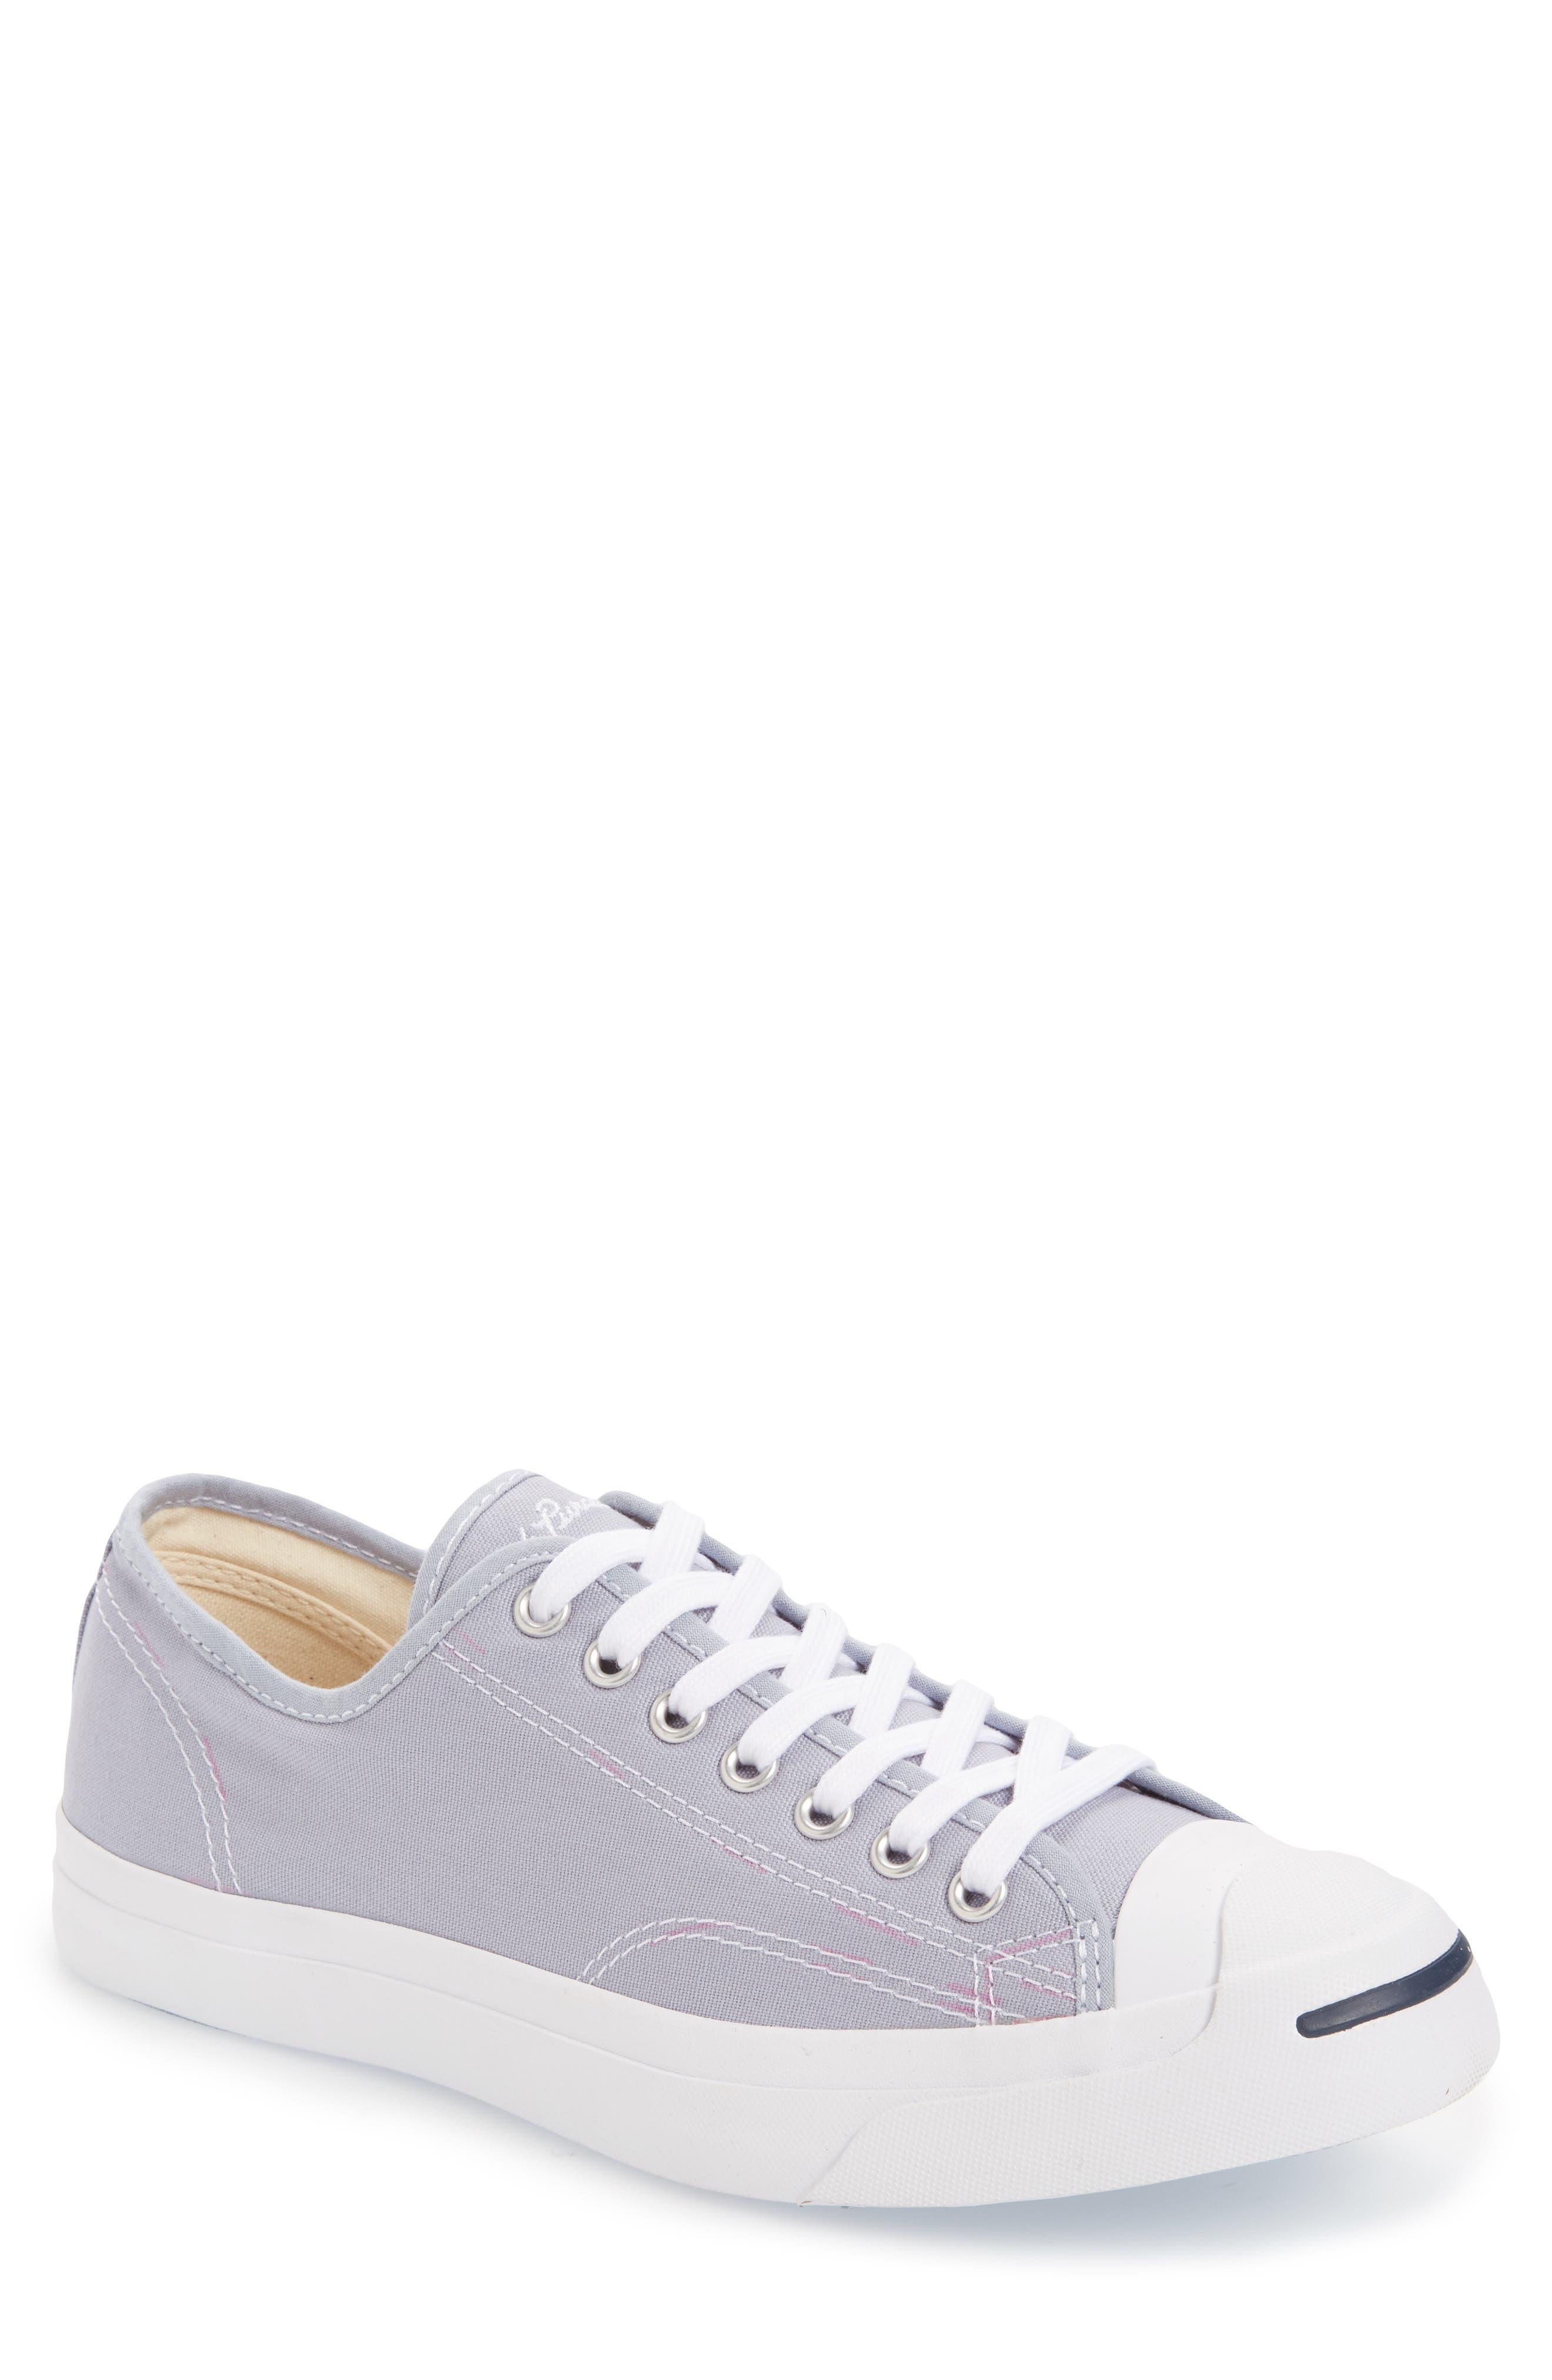 CONVERSE JP Jack Sneaker